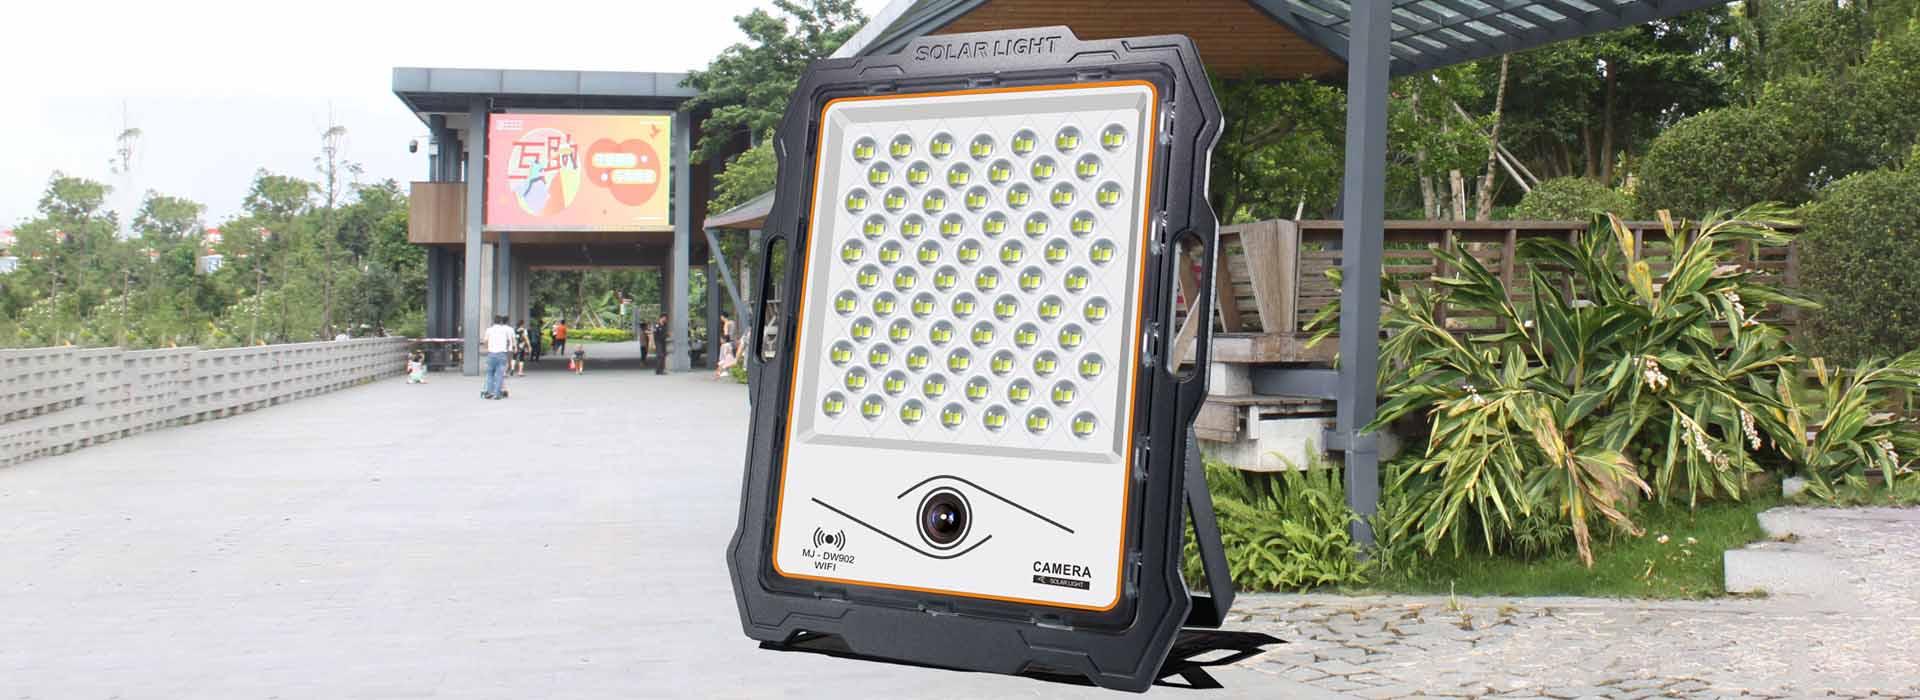 solar-led-camera-light-1920x700